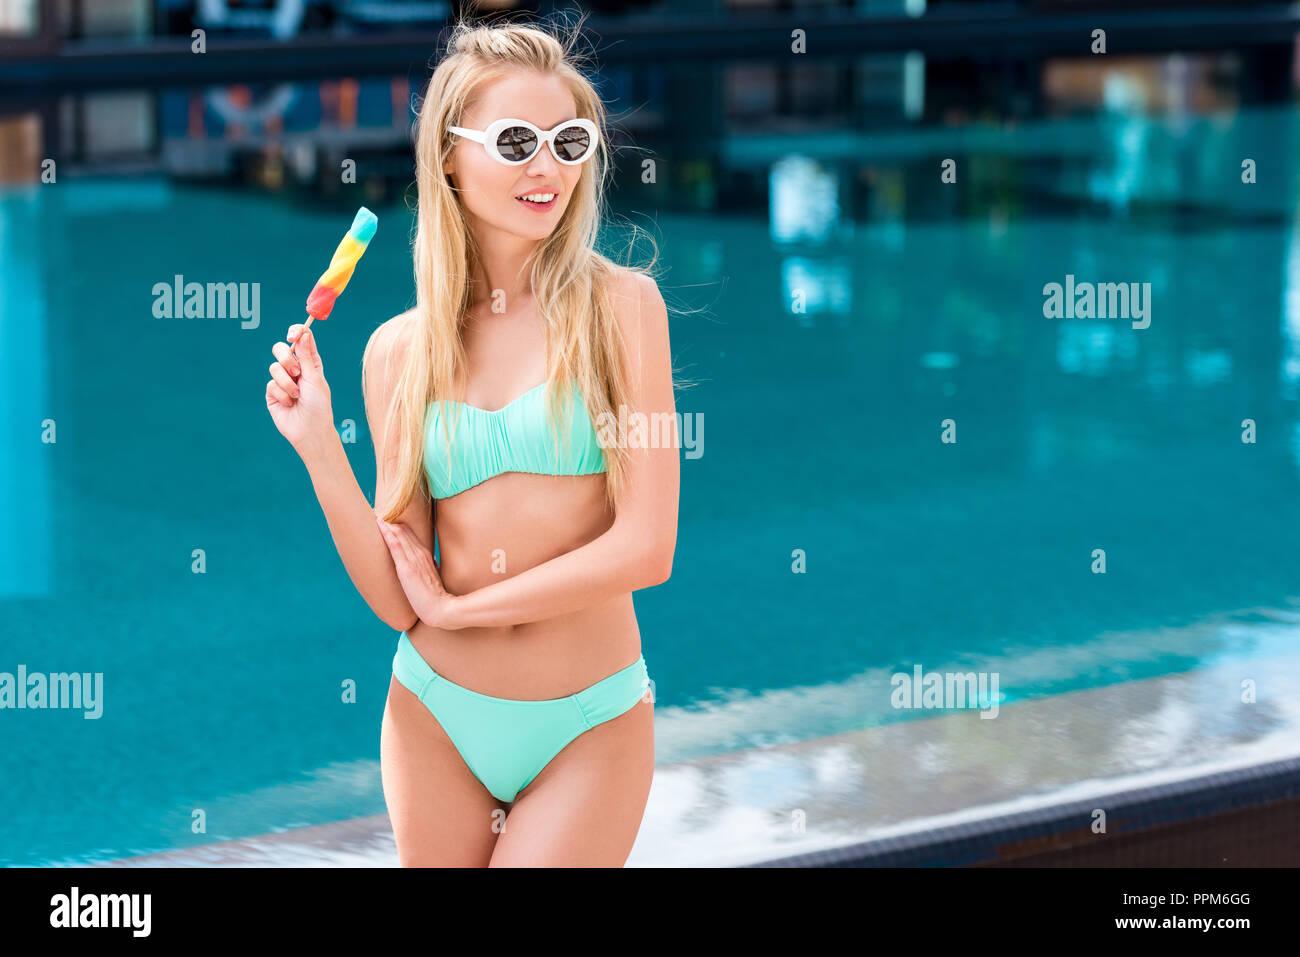 69c469fa9eaf Cold Woman Bikini Imágenes De Stock & Cold Woman Bikini Fotos De ...